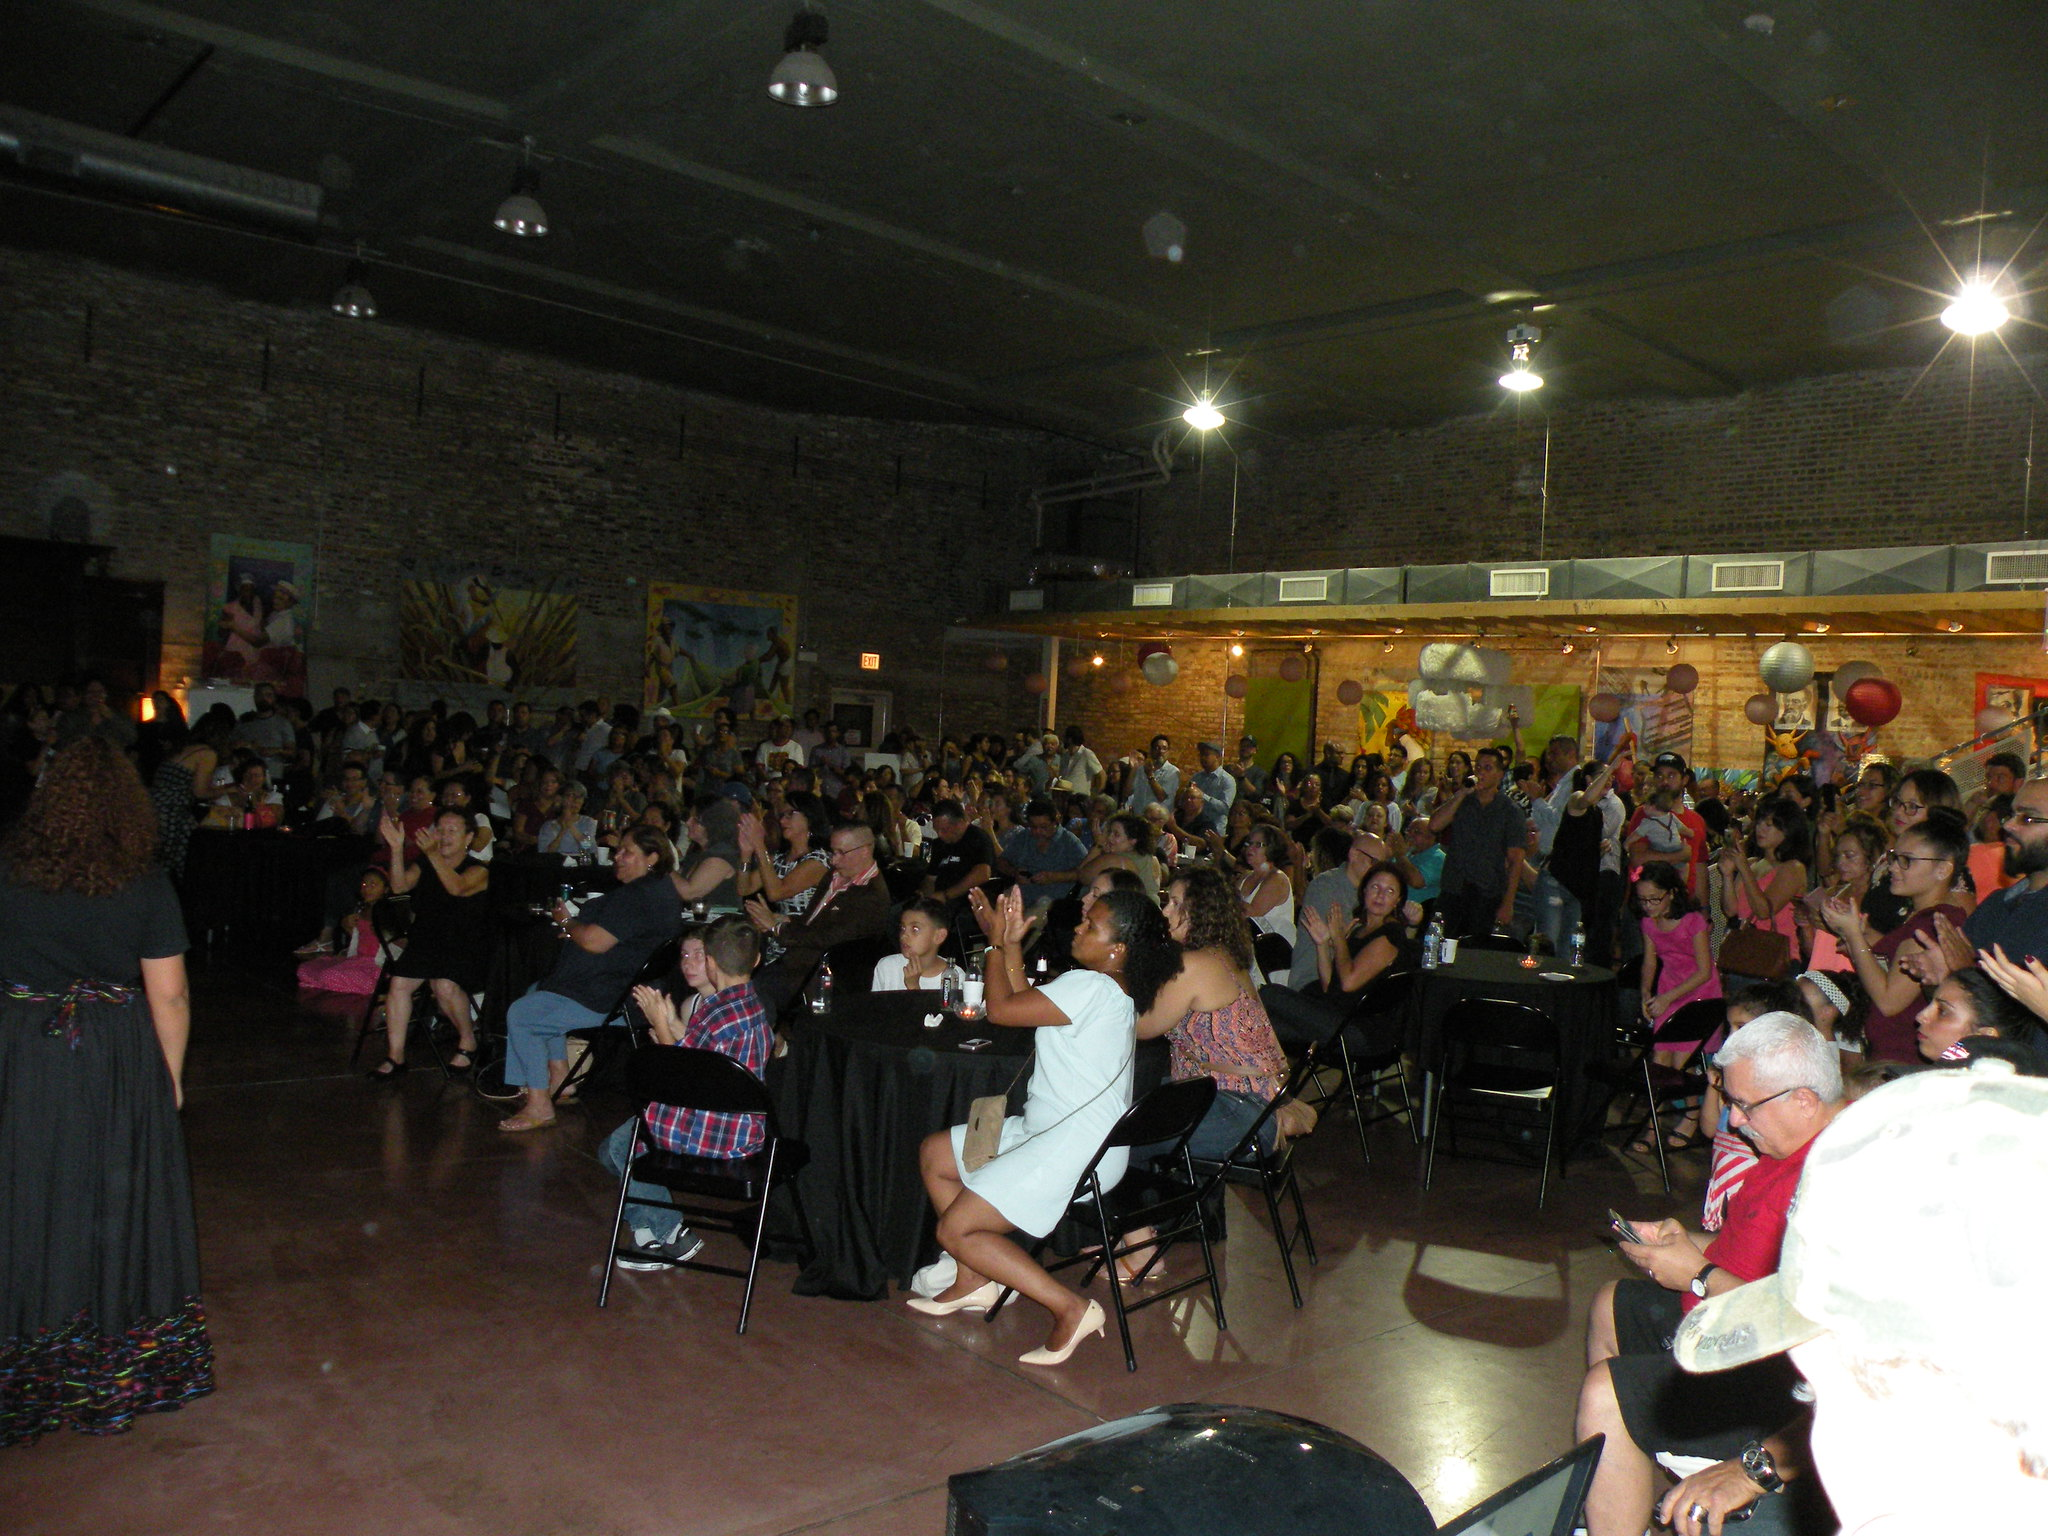 Hurricane Maria Community Benefit (September 22, 2017)